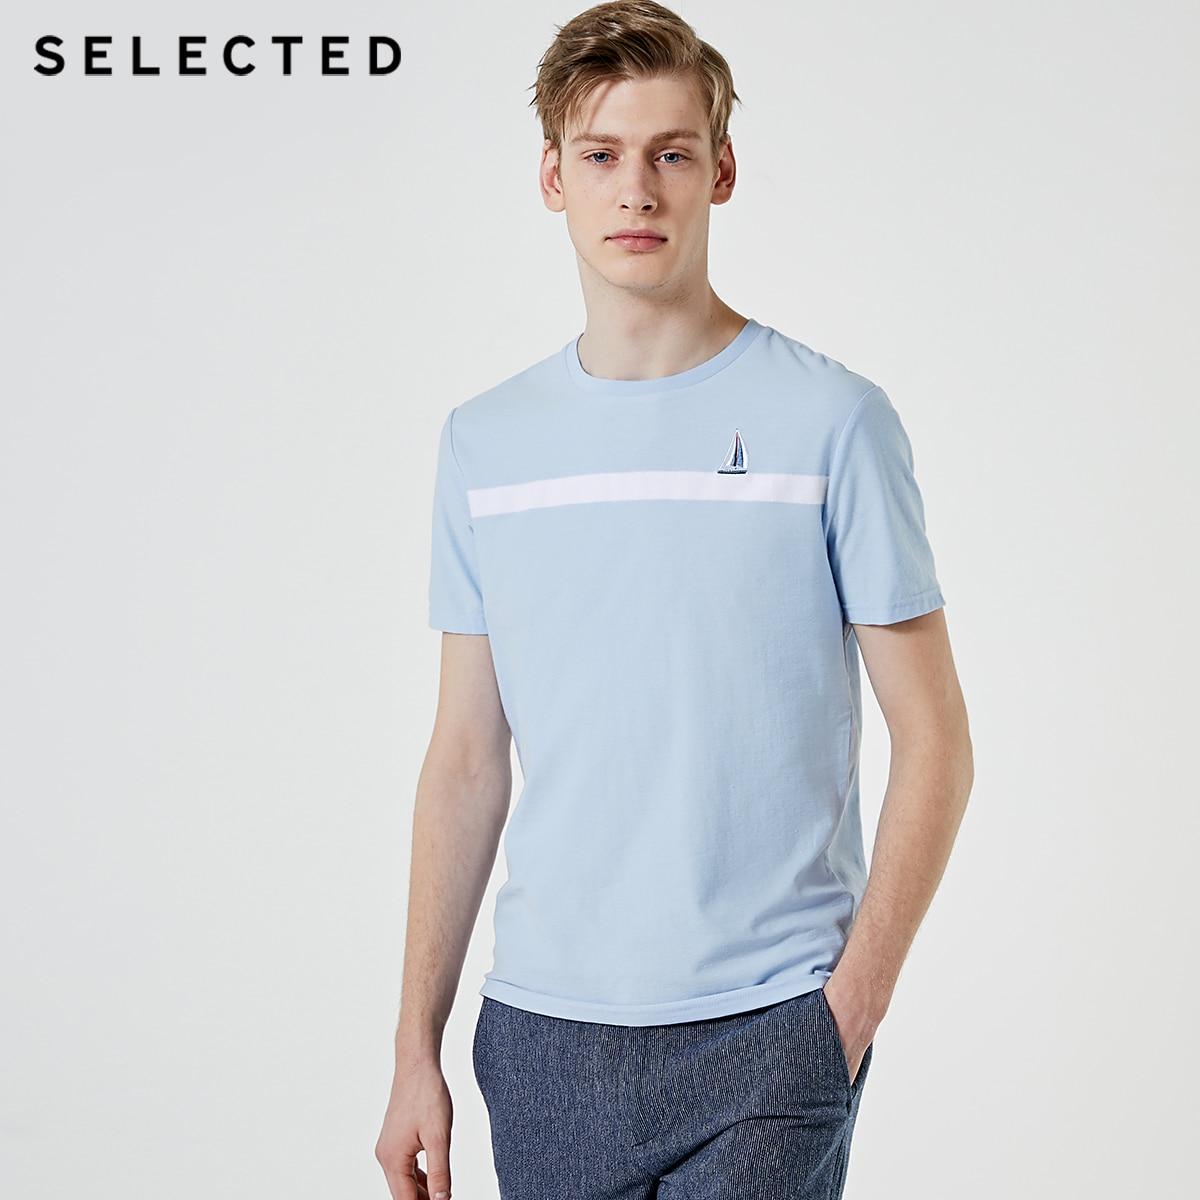 SELECTED Men's 100% Cotton Round Neckline Short-sleeved T-shirt S|419201563